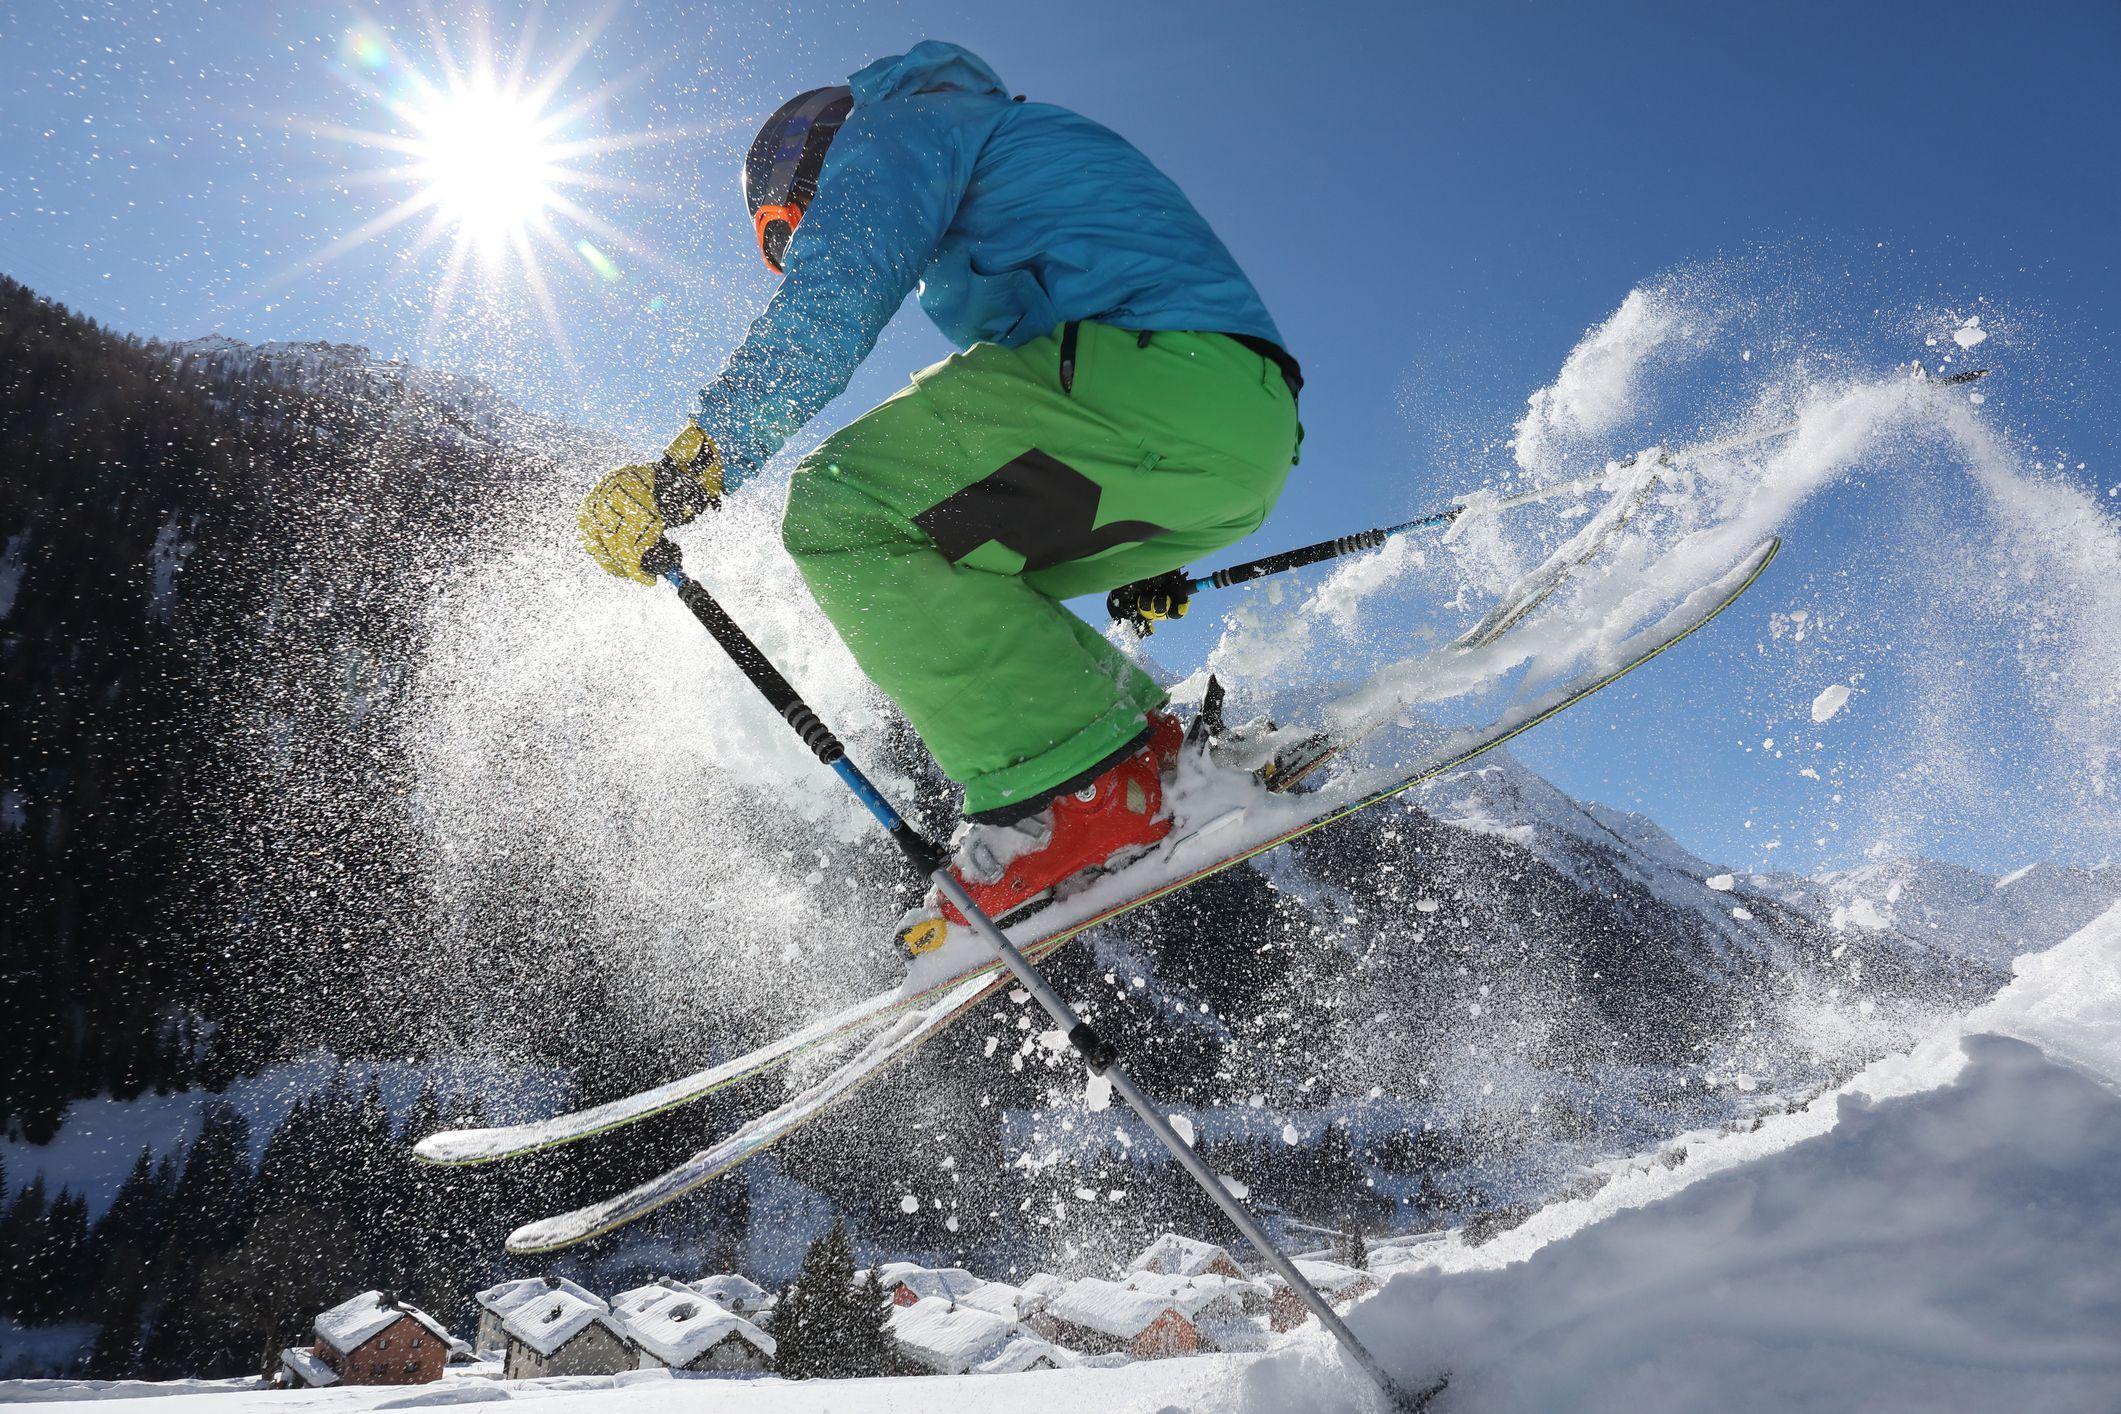 The 9 Best Snowboard Pants